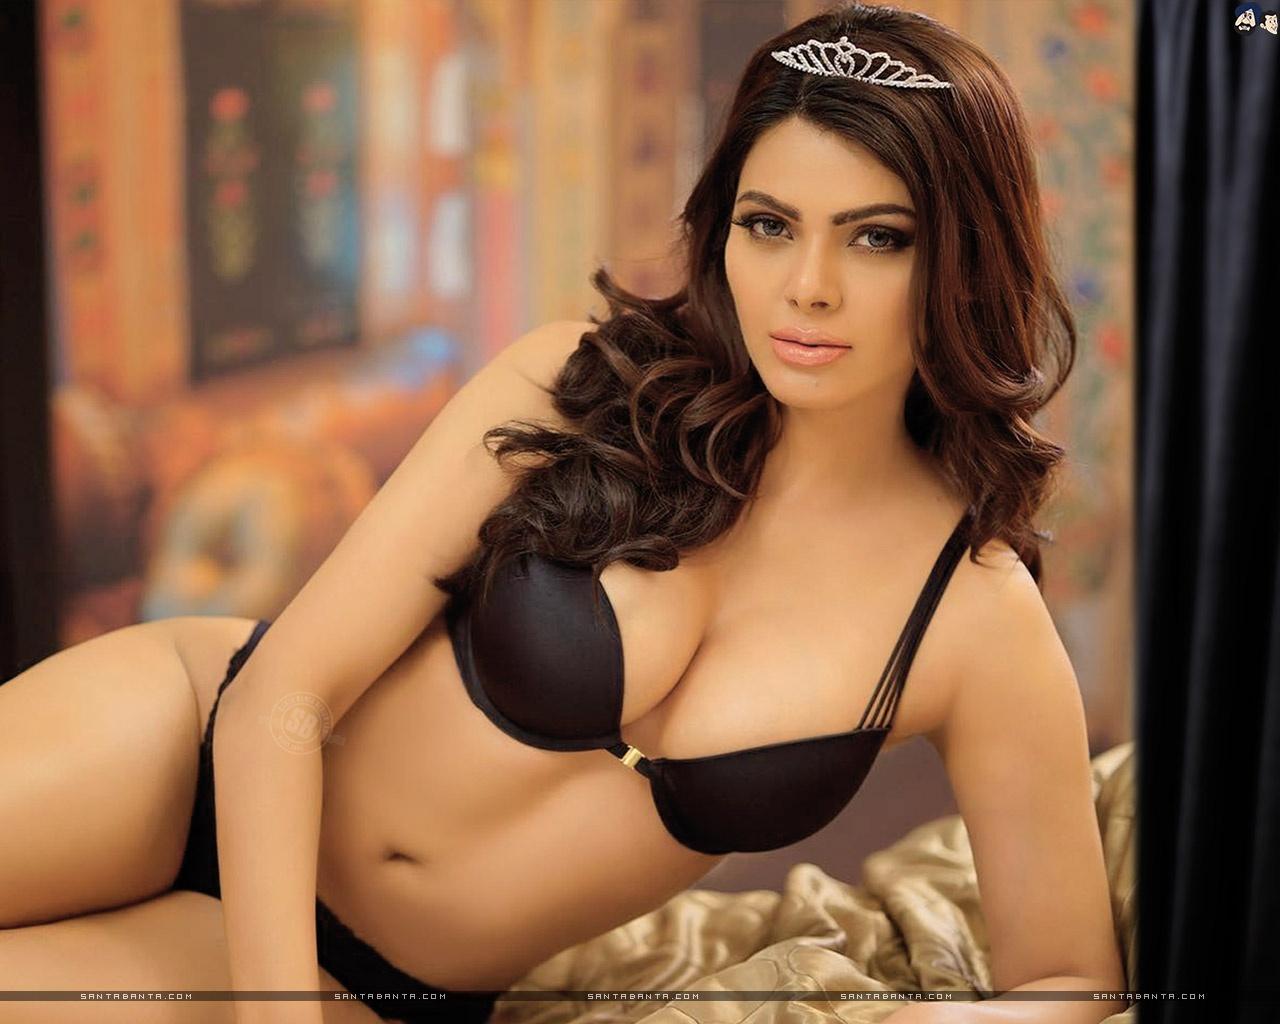 Amisha Patel Nude Video do bollywood actress escort secretly? - quora